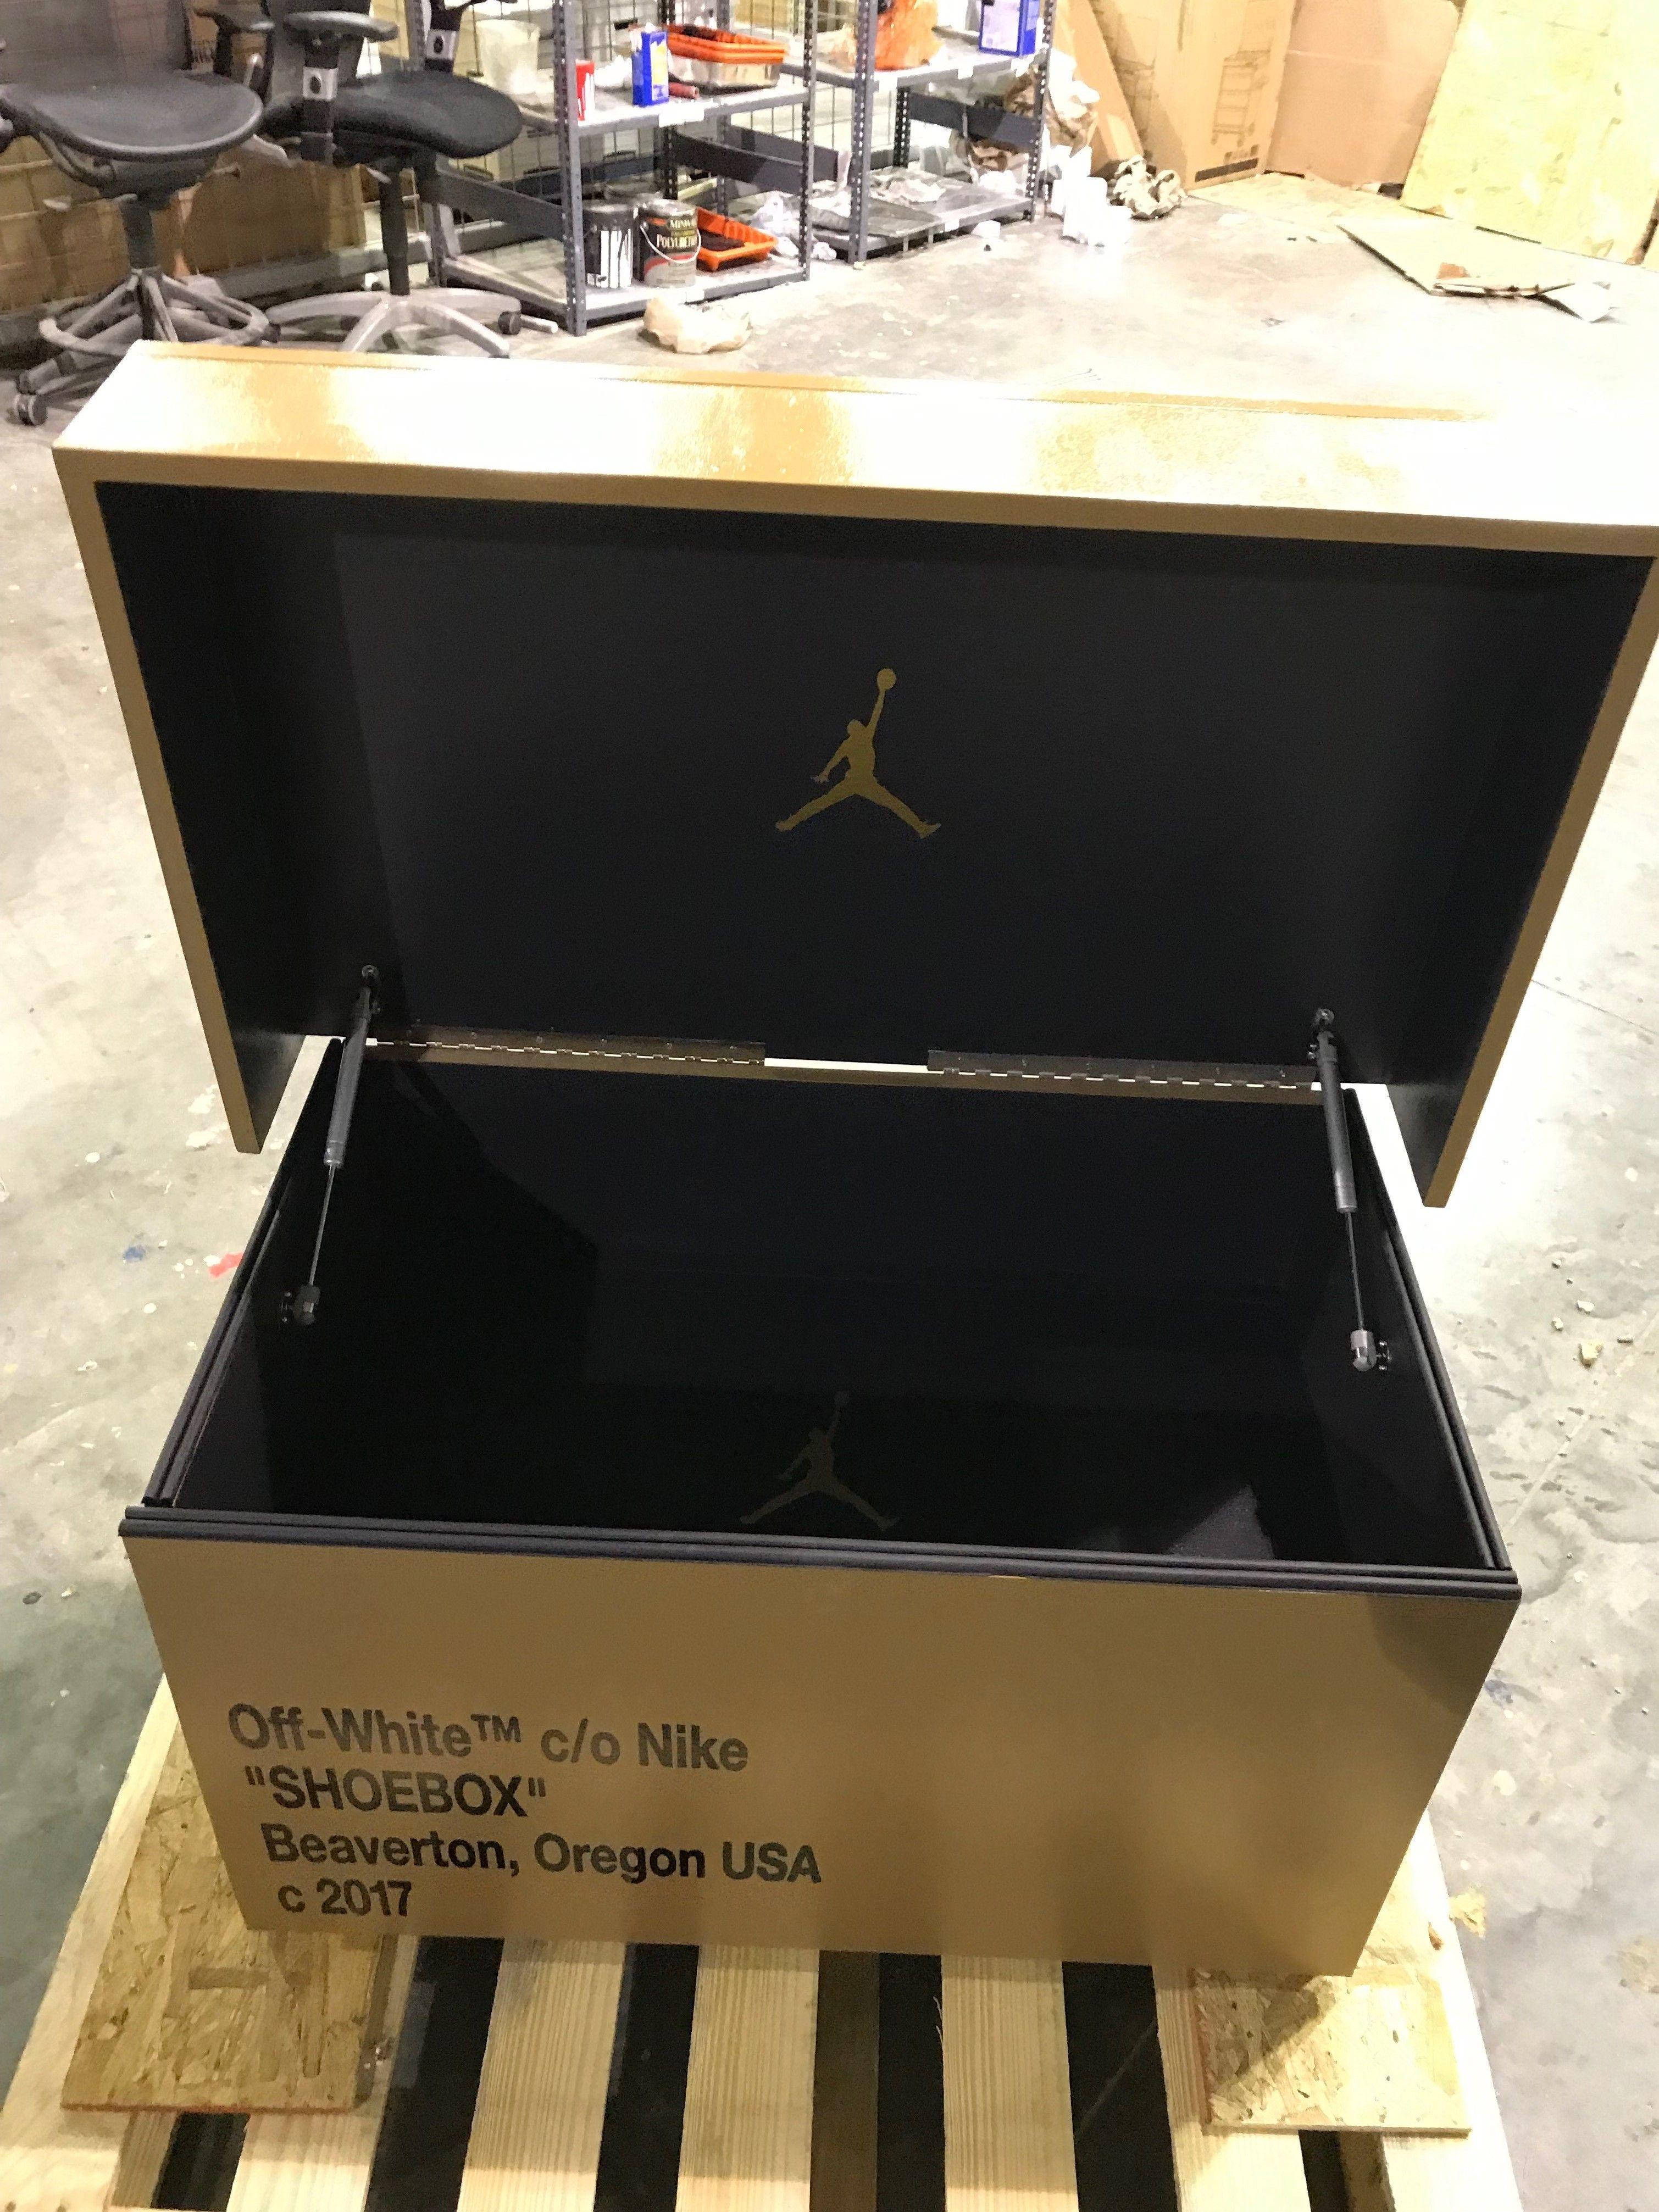 OFF WHITE Giant Shoe Box - Custom Shoe